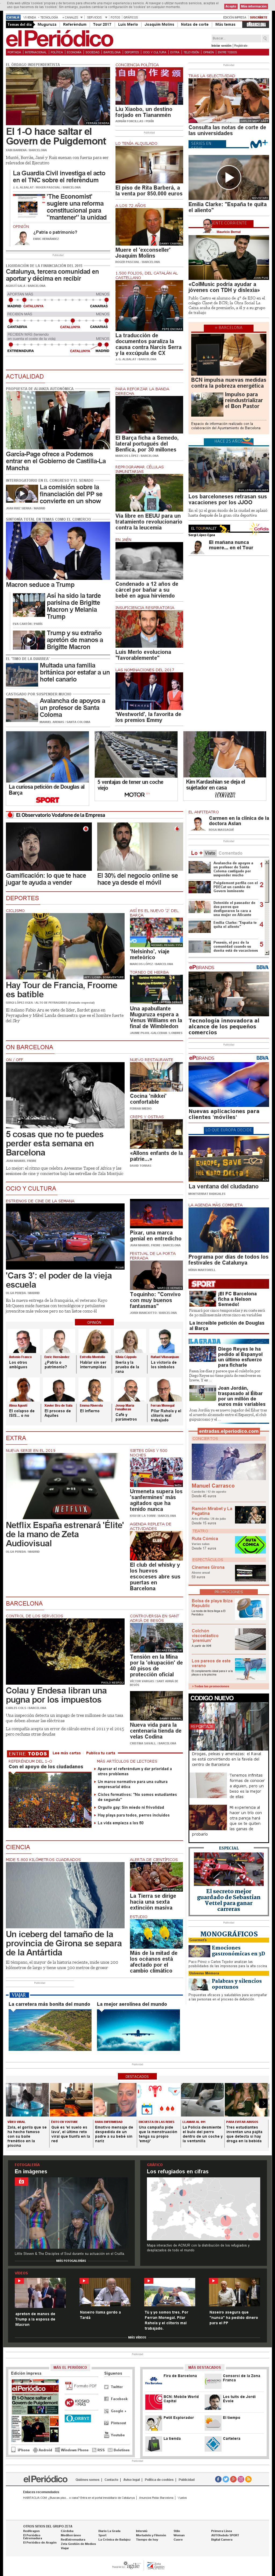 El Periodico at Friday July 14, 2017, 4:12 a.m. UTC